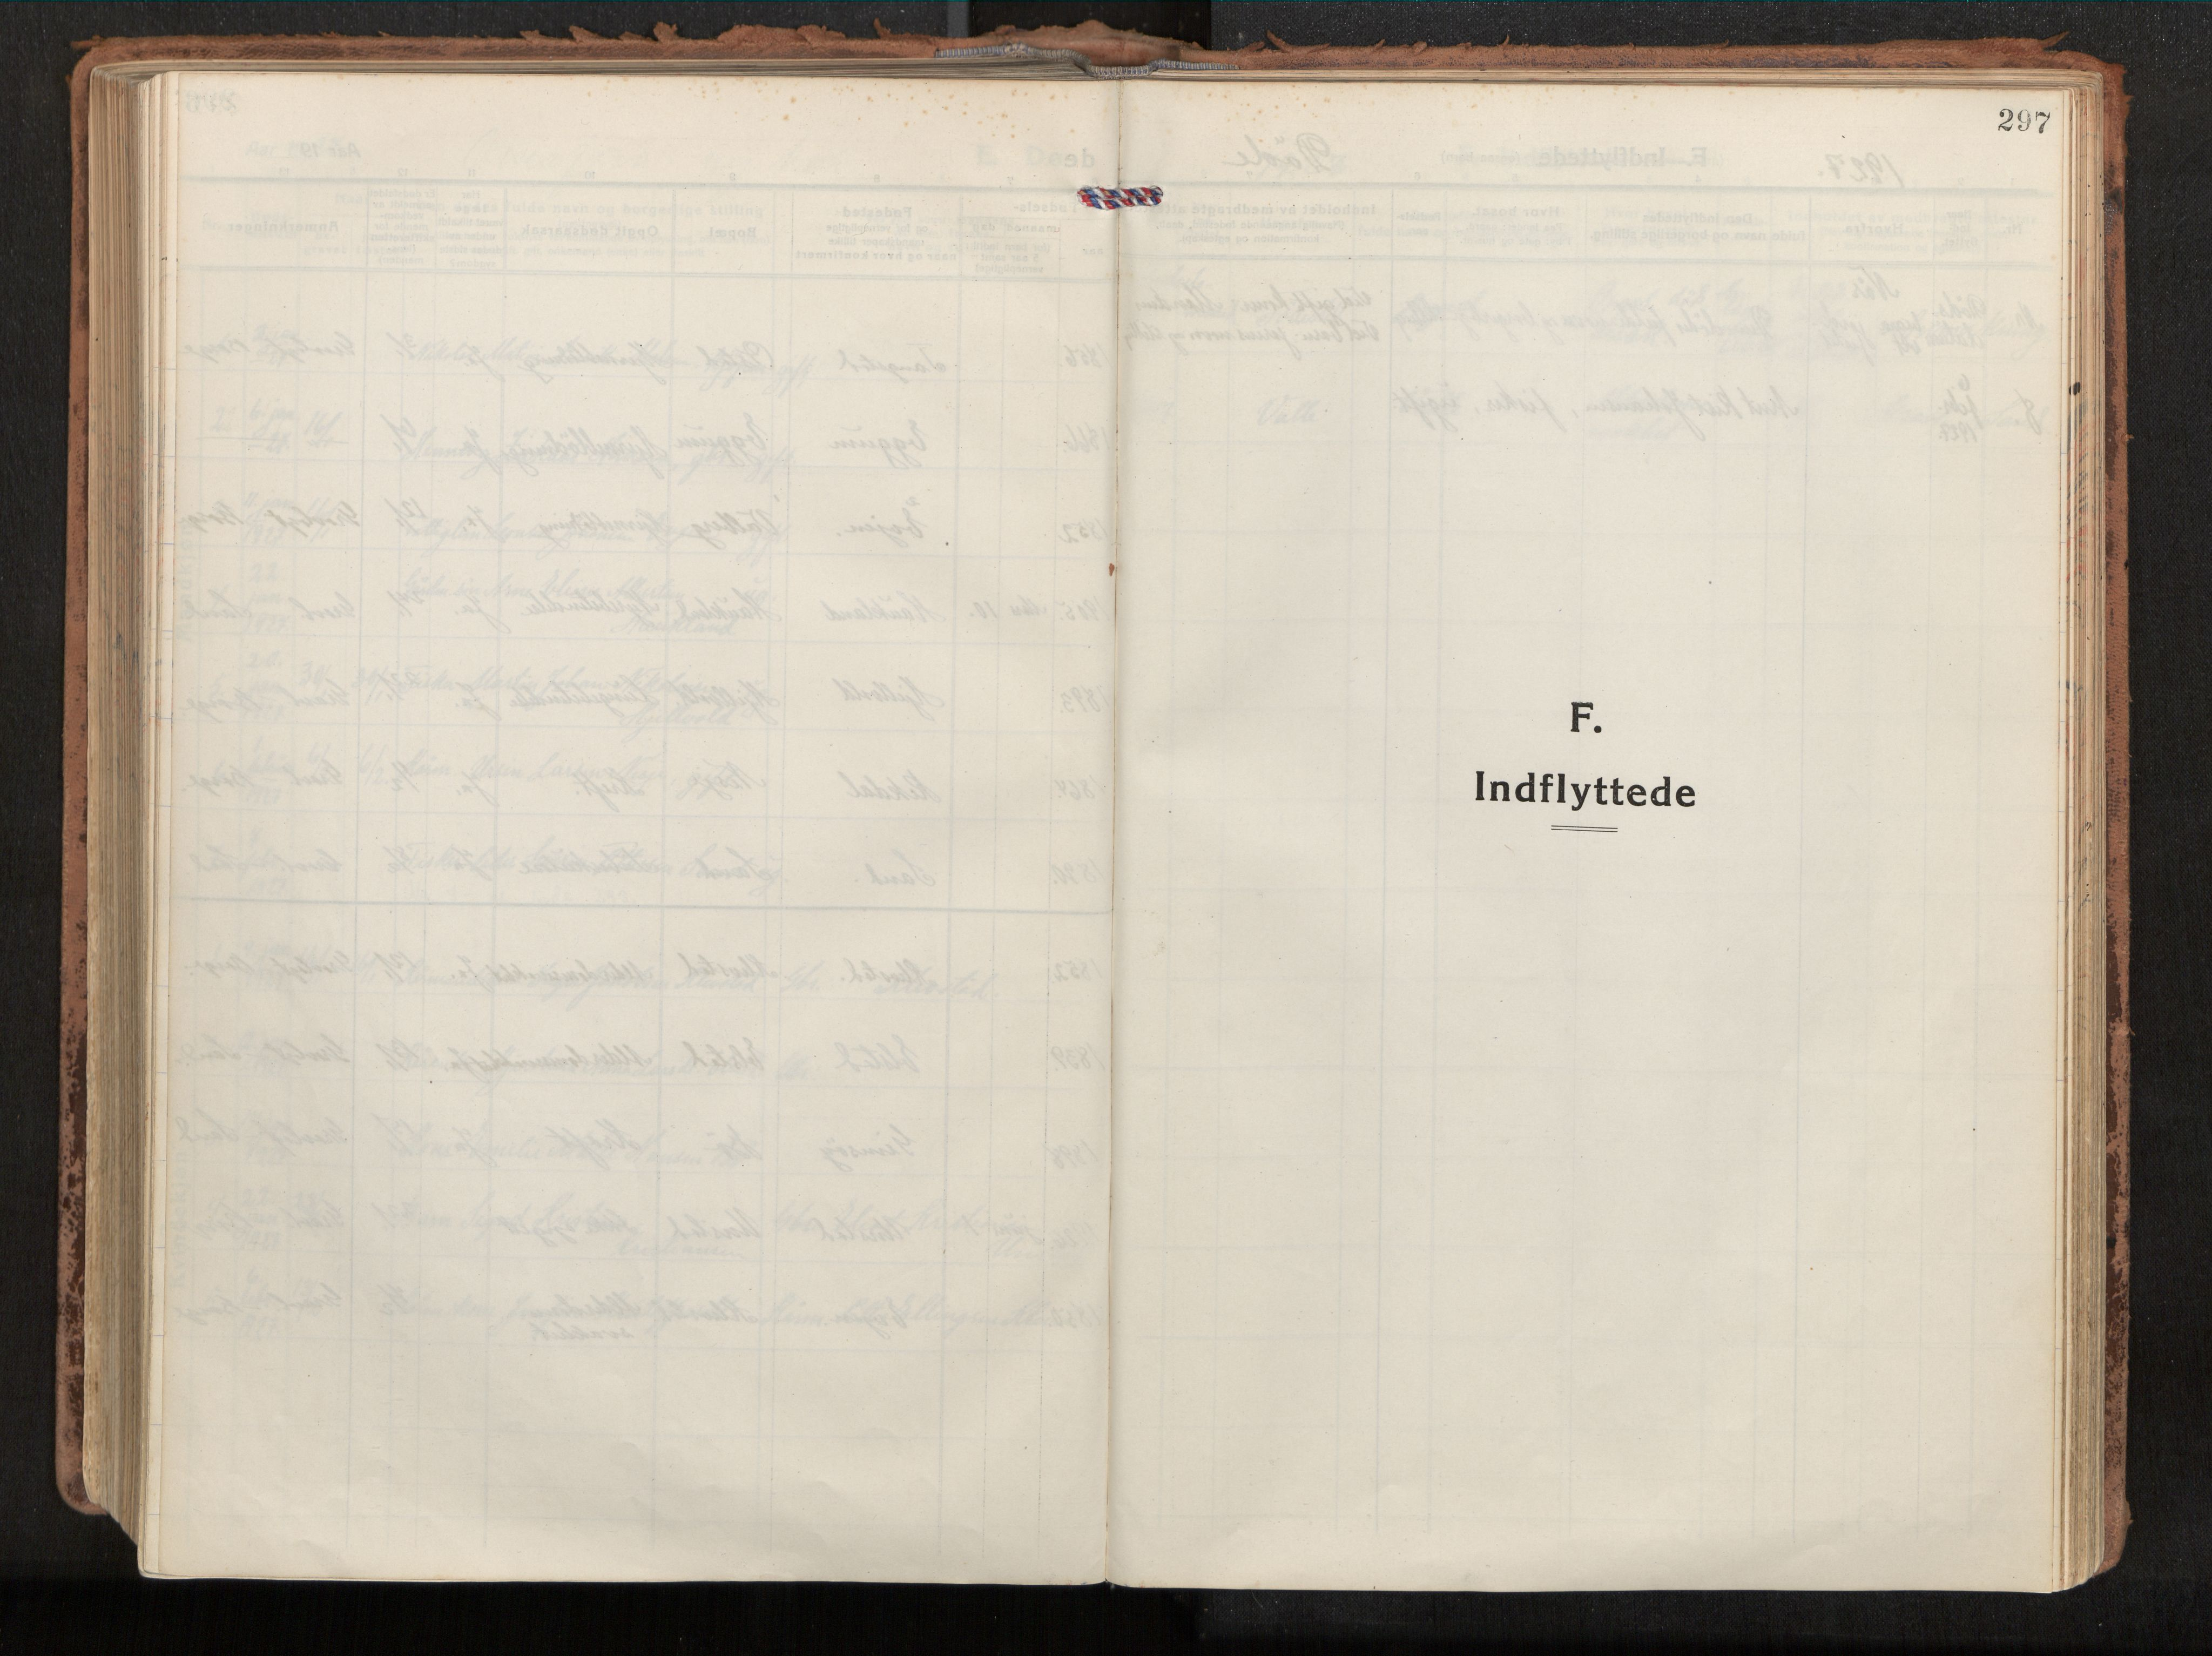 SAT, Ministerialprotokoller, klokkerbøker og fødselsregistre - Nordland, 880/L1136: Ministerialbok nr. 880A10, 1919-1927, s. 297